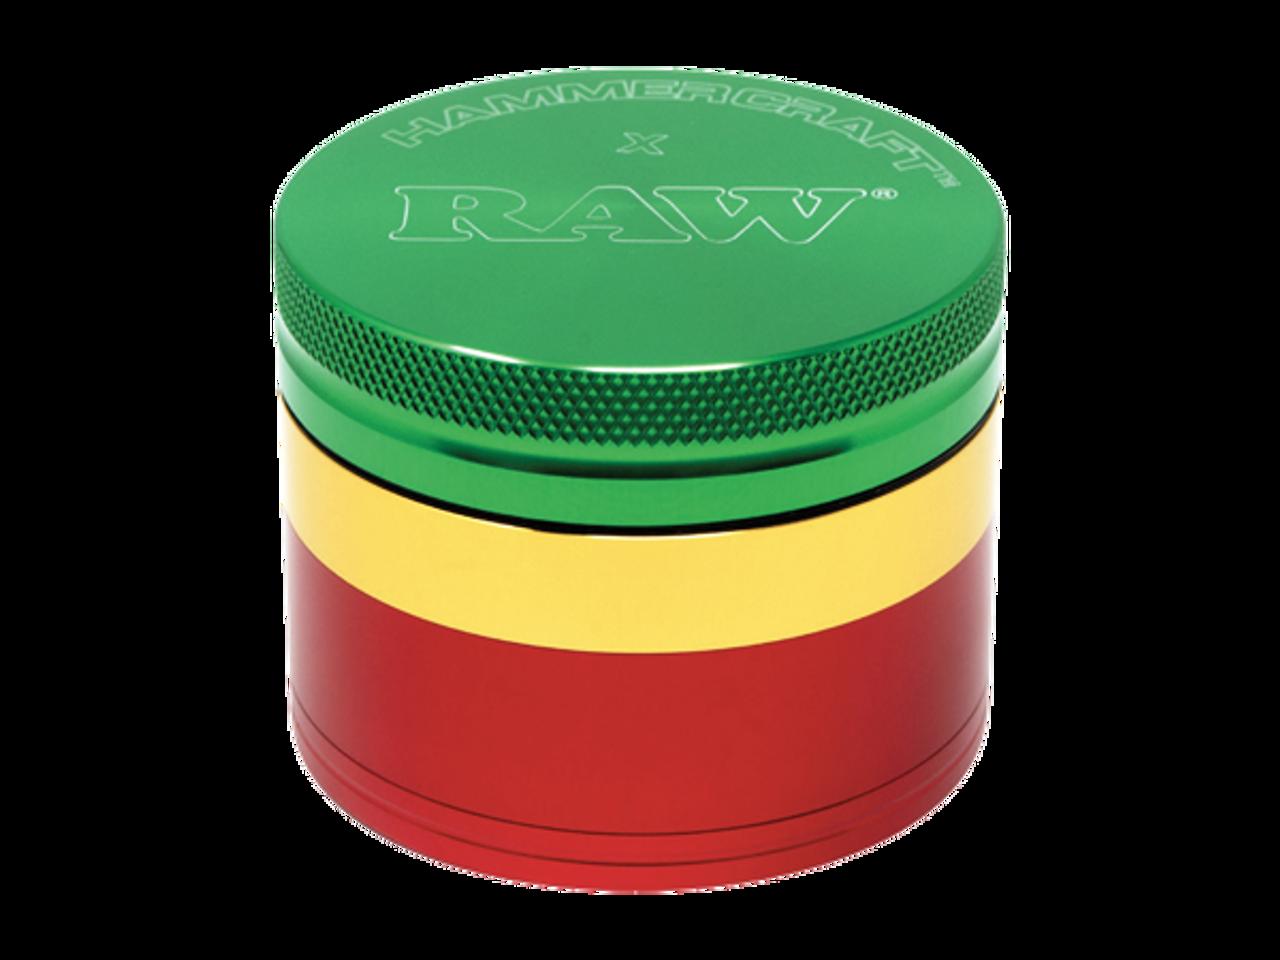 RAW Raw X Hammercraft Grinder - Rasta at The Cloud Supply